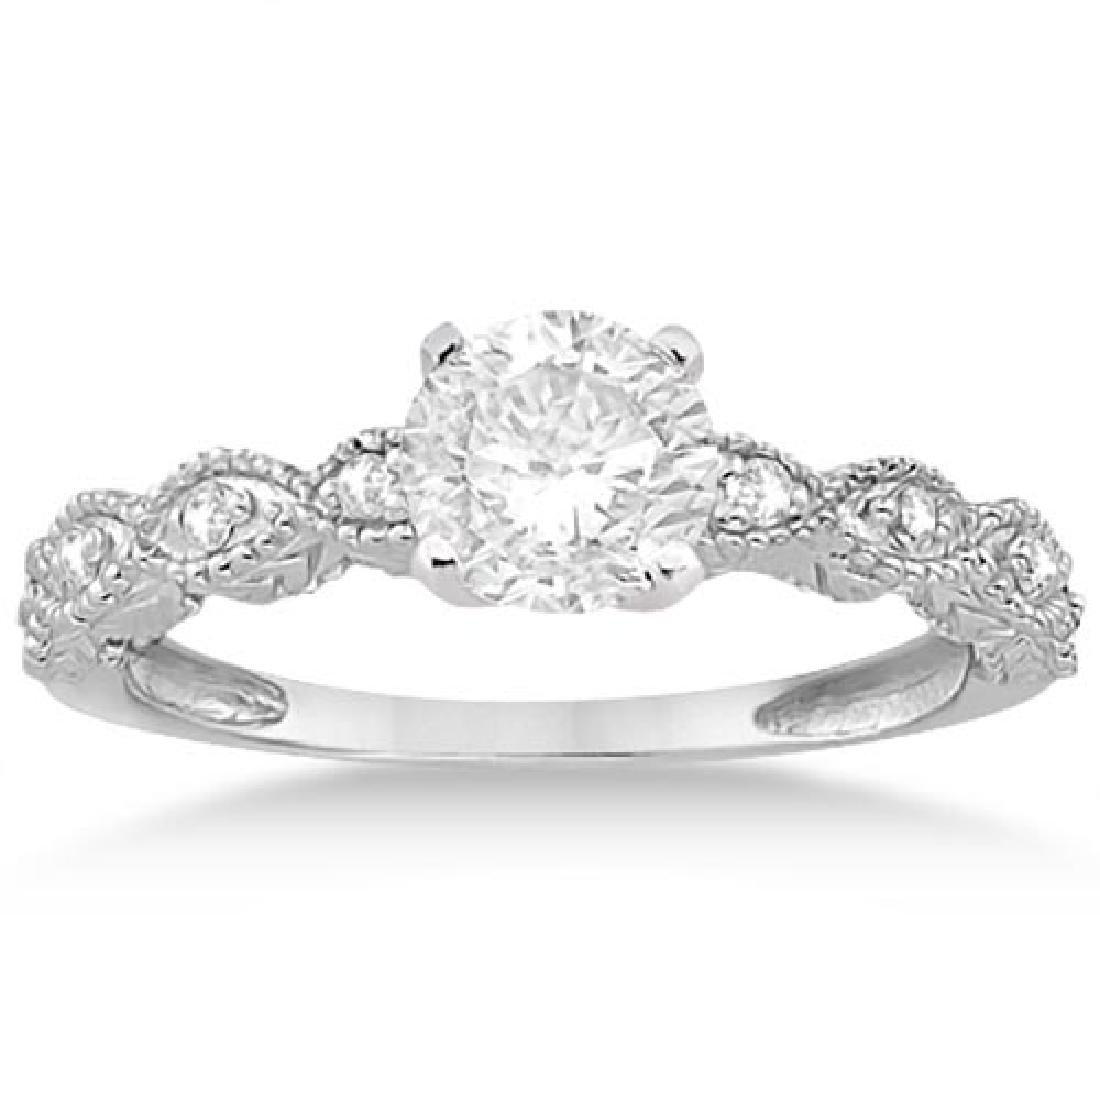 Petite Marquise Diamond Engagement Ring 14k White Gold